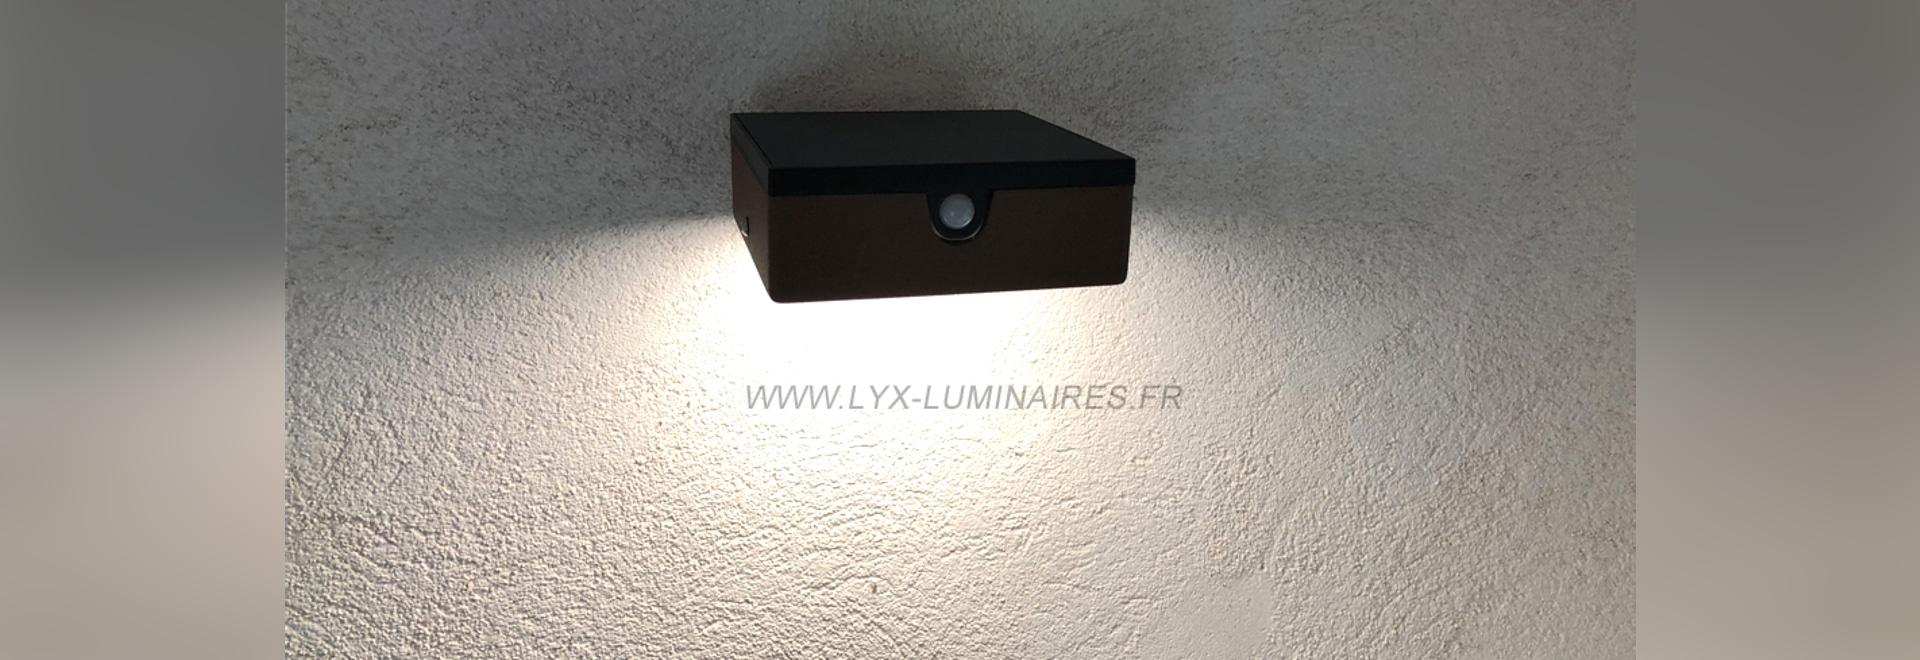 Solarwandlampe APS 010